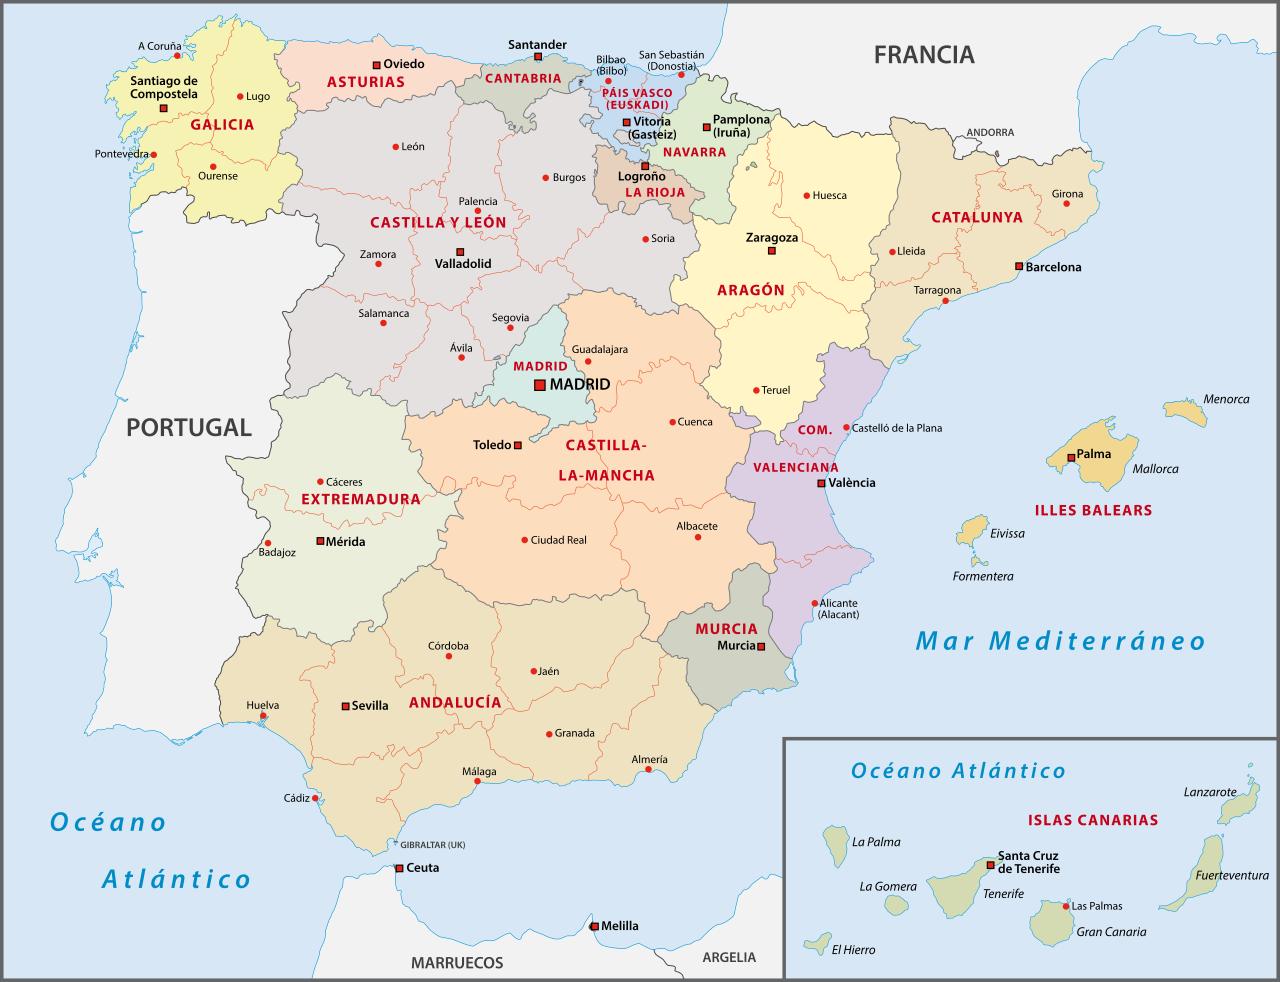 Spain's Prime Minister outlines his plan for de-escalation.